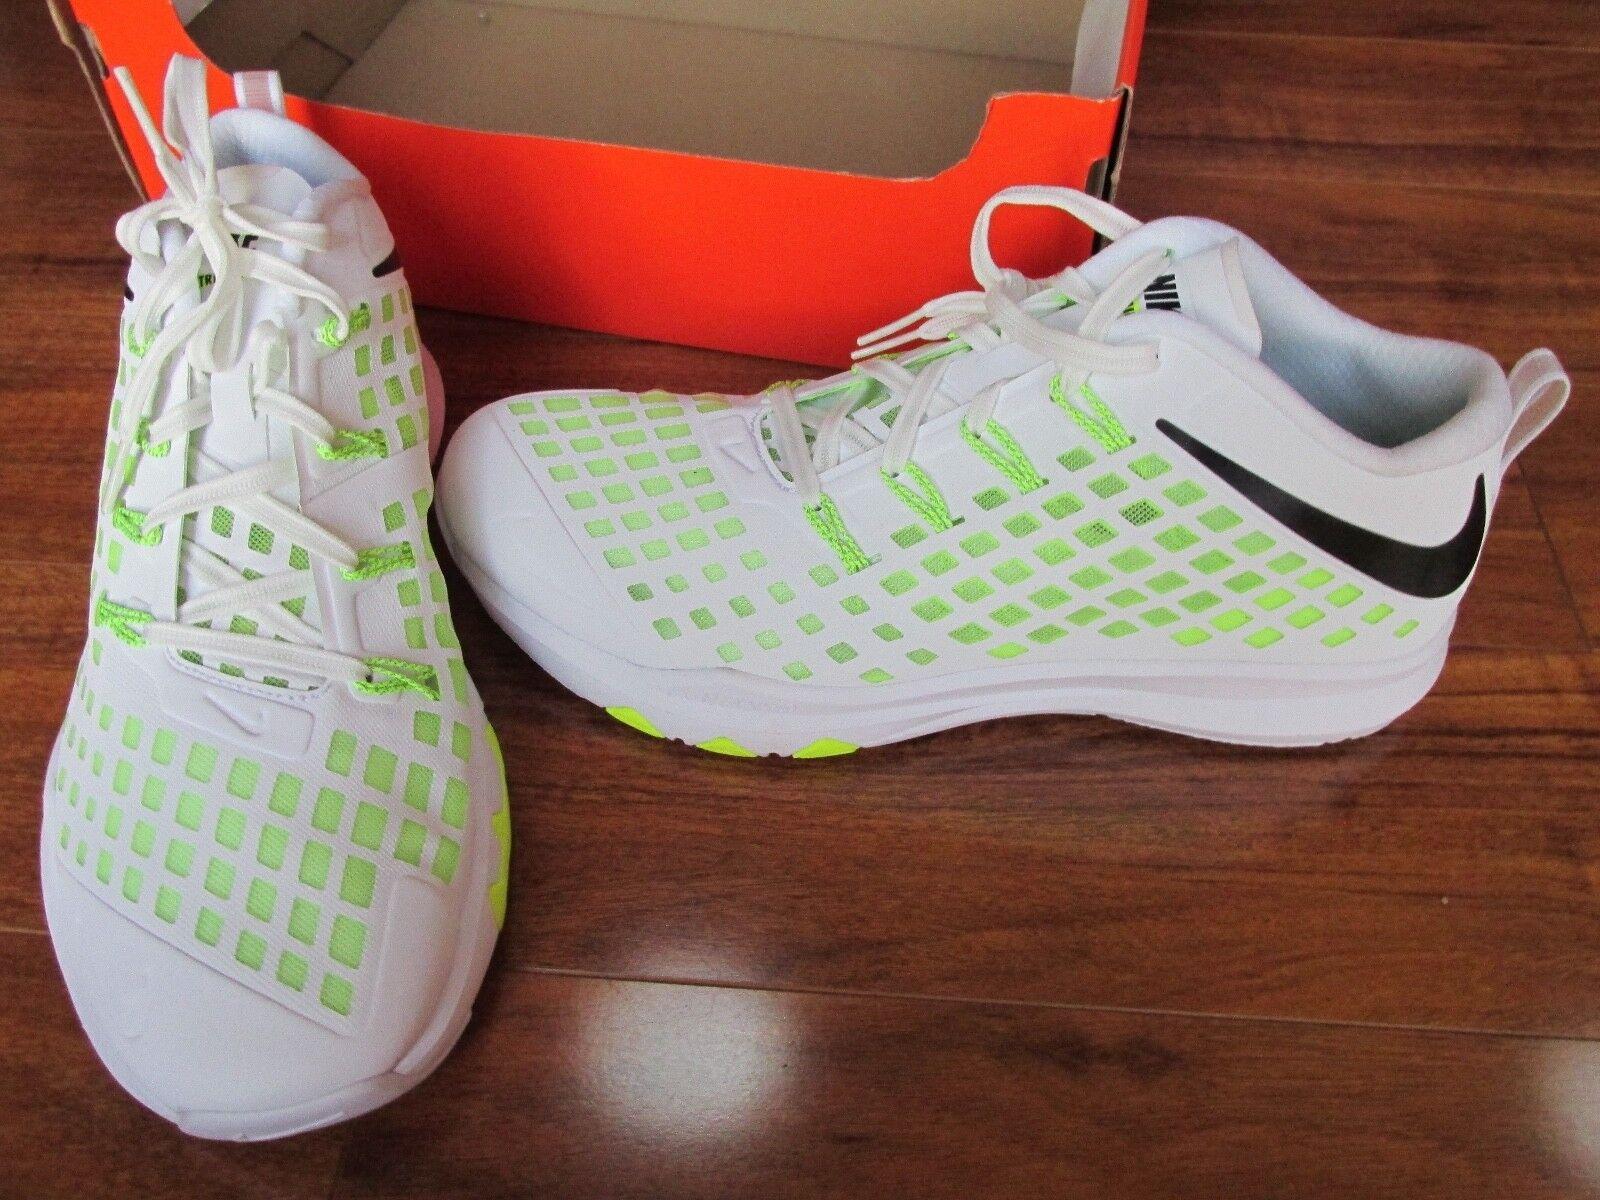 NEW Nike Train Quick Training shoes MENS 11 White Black Volt 844406-107  140.